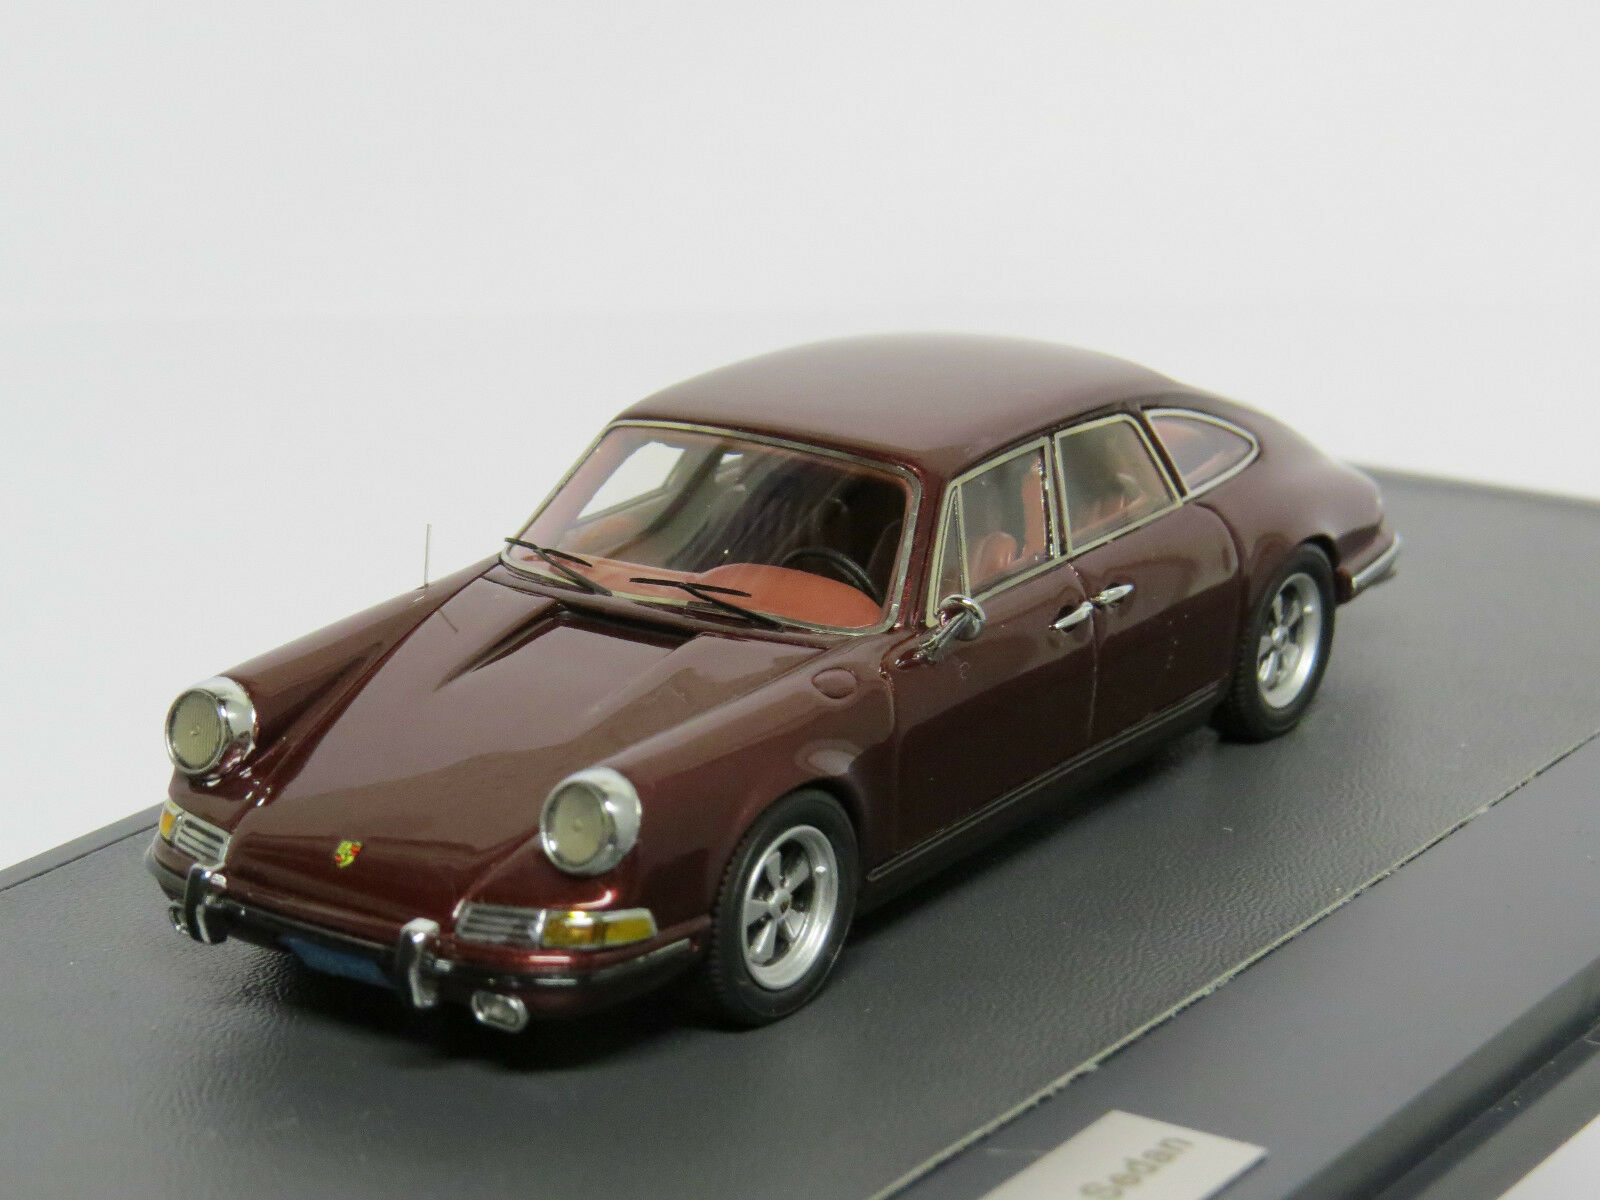 "Trouwman & Barnes 911 Sedan Porsche 1 43 ""rosso"" Matrix MX 41607-022"